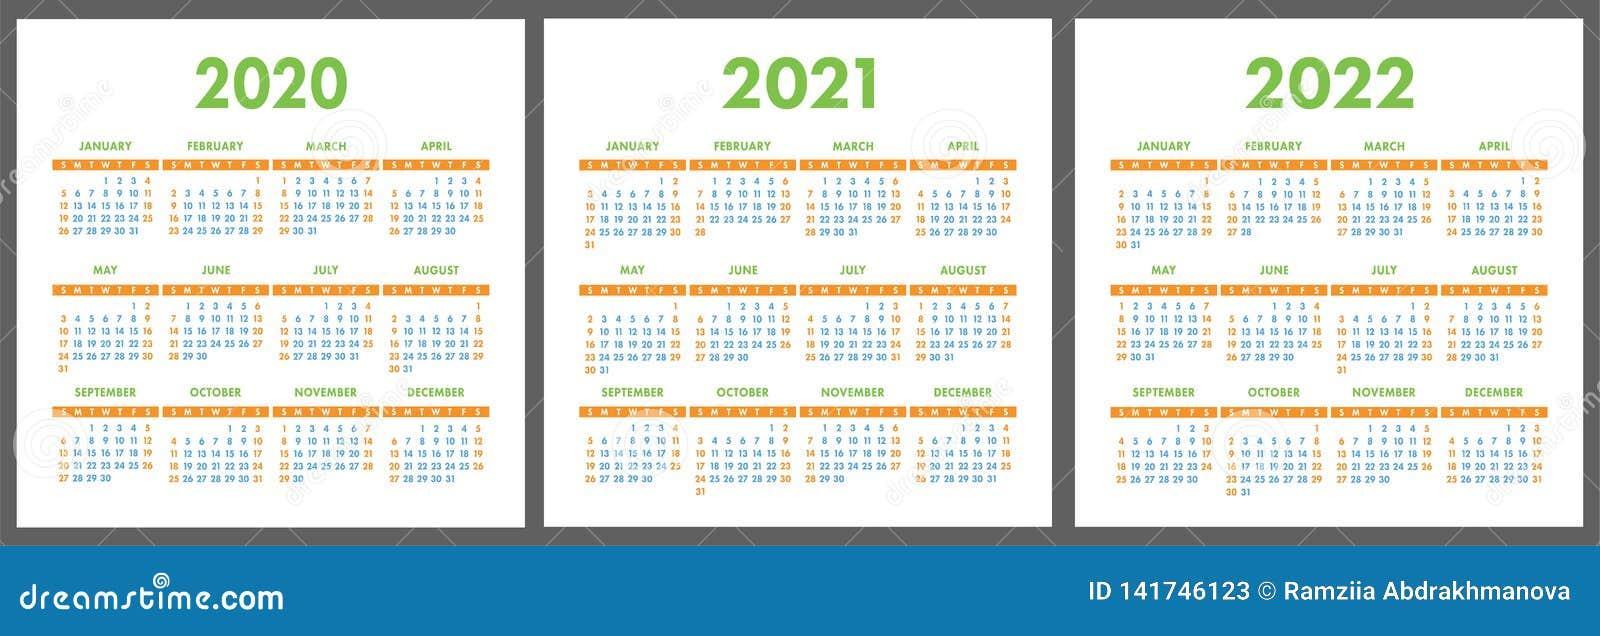 Calendrier 2020 Vectoriel Gratuit.Calendrier 2020 2021 2022 Ans Calibre Vertical De